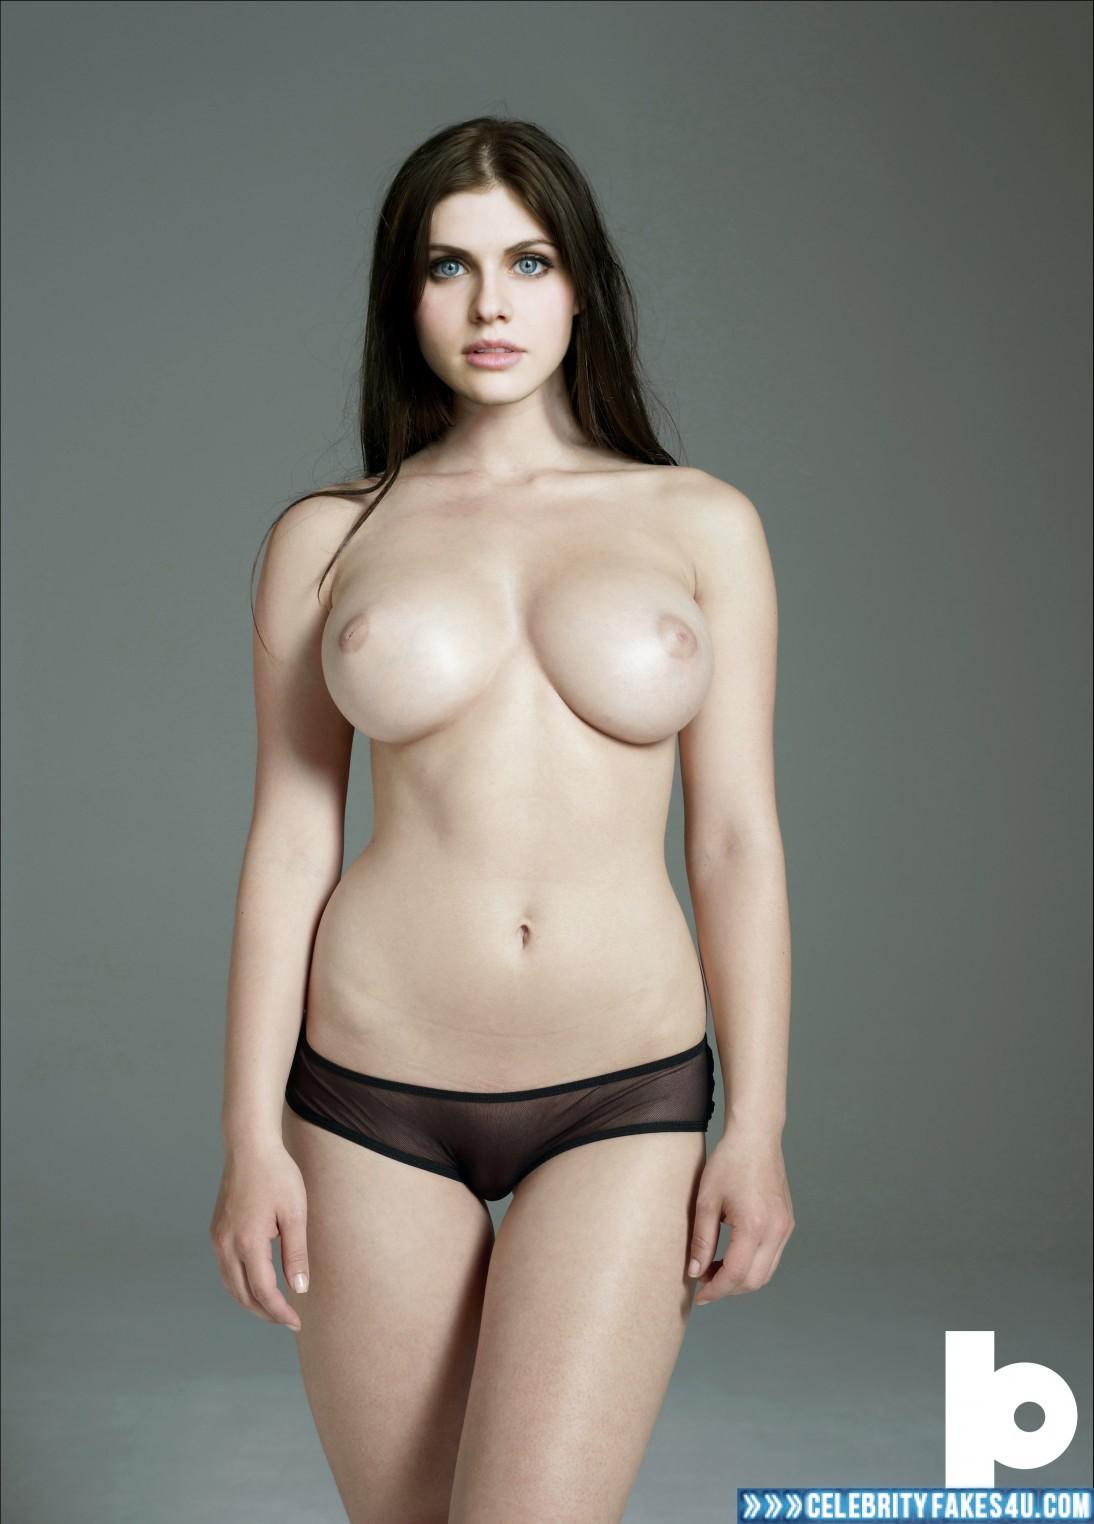 Andrea Daddario Nude alexandra daddario fakes (164 nude photos) « celebrity fakes 4u